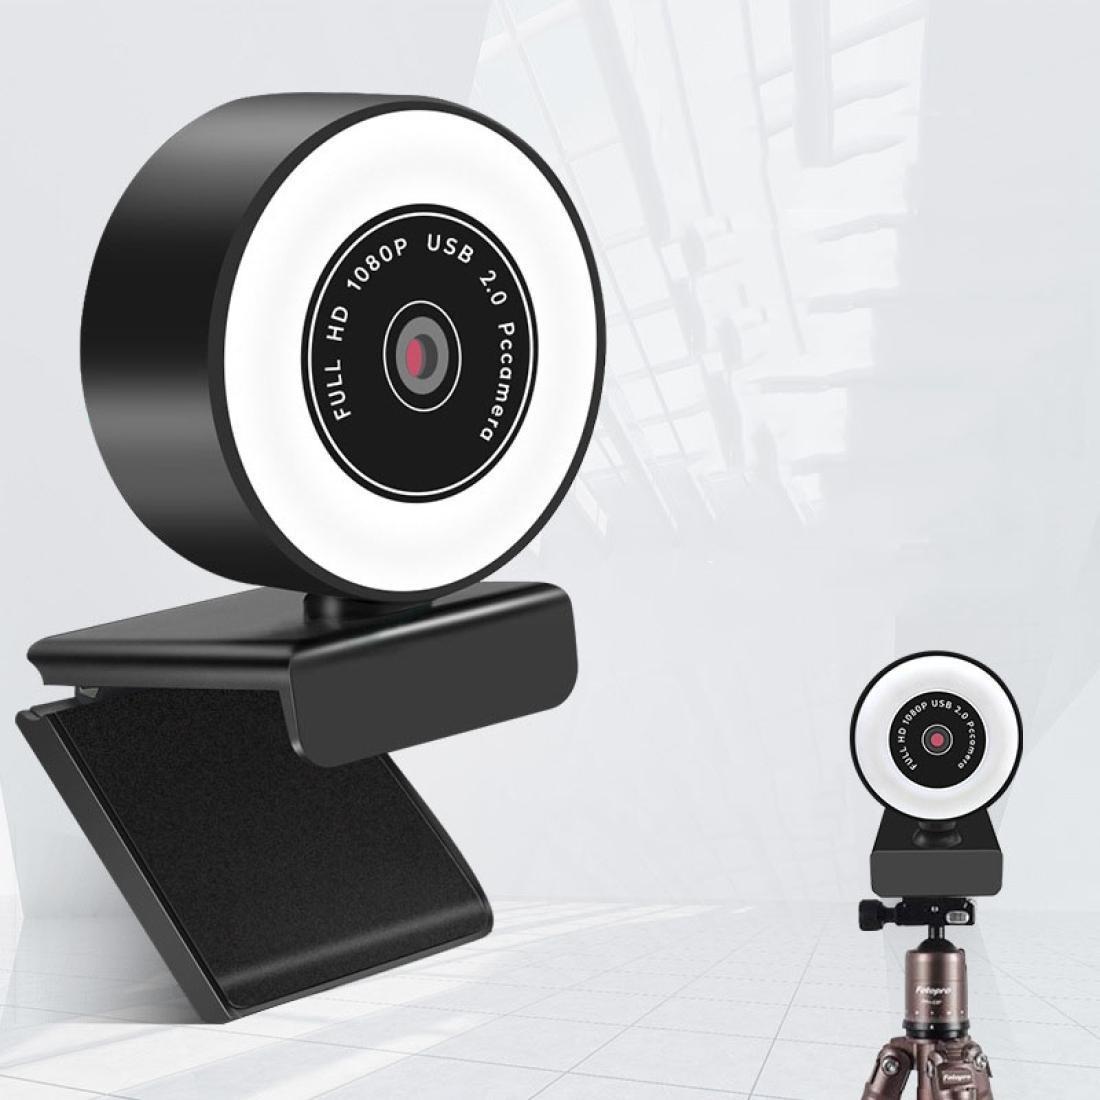 Caméra lumineuse HD sans lecteur HD A9mini USB avec microphone pixel10 millions de pixels 720p